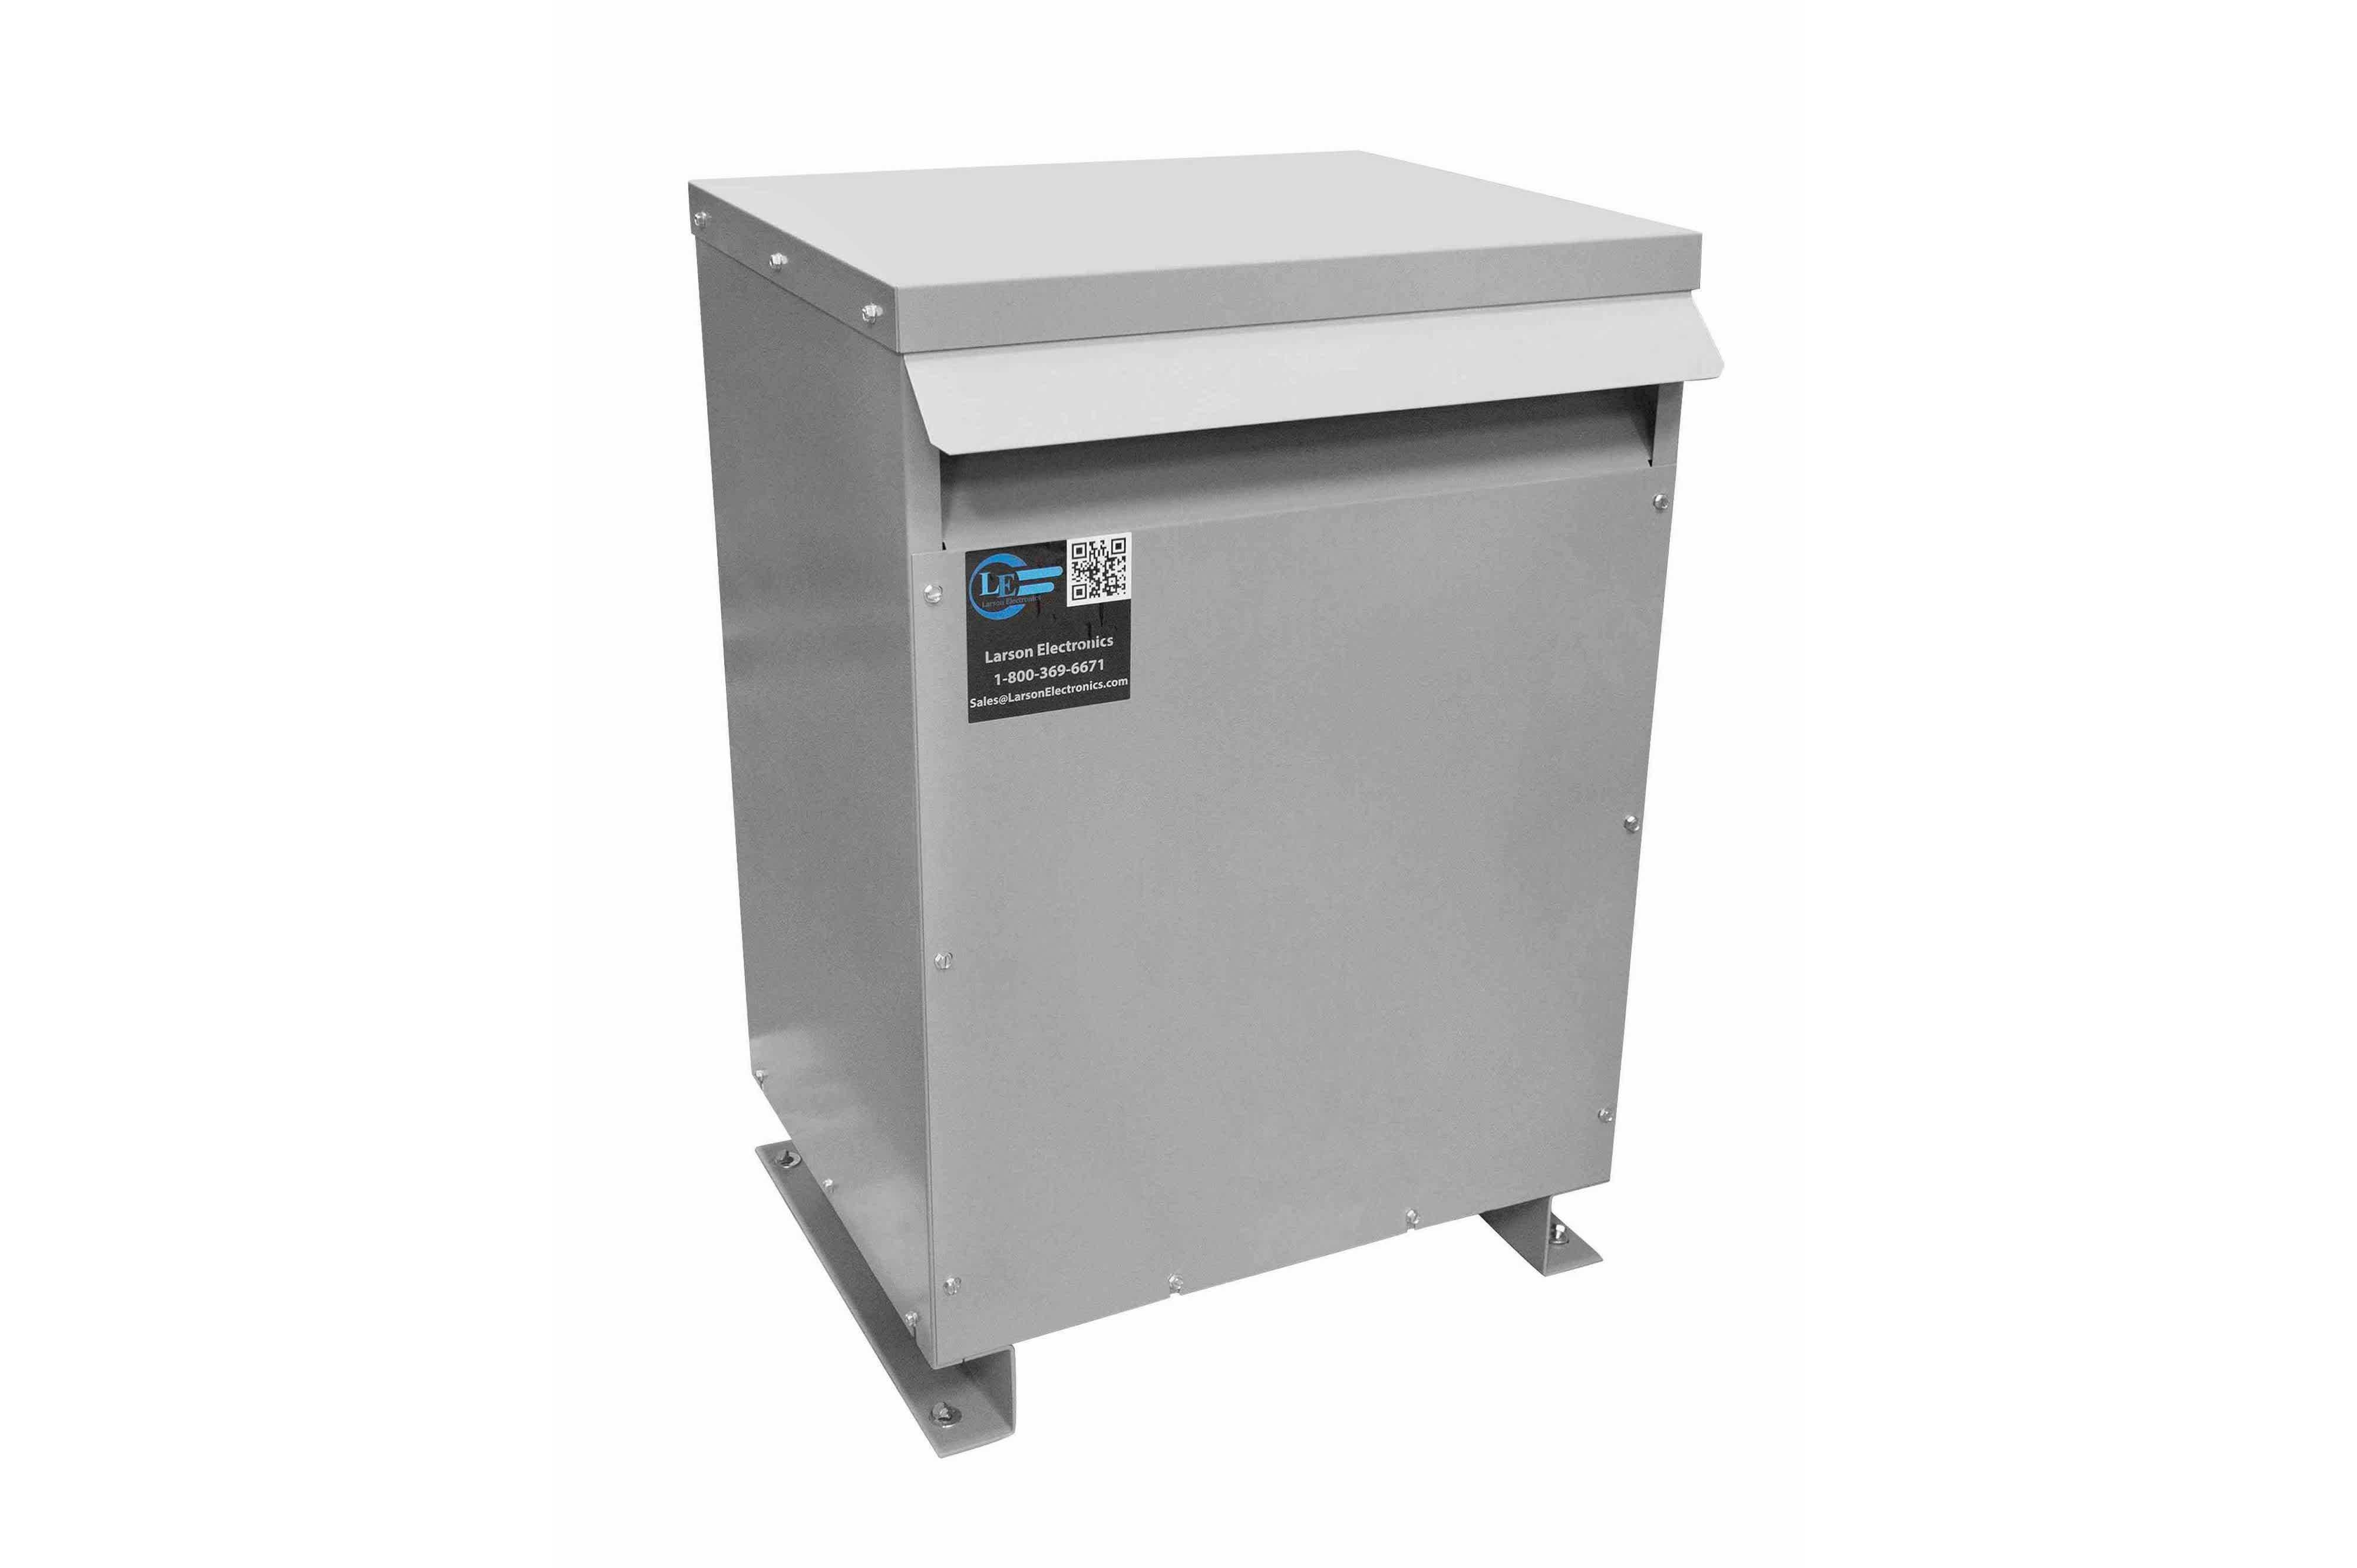 100 kVA 3PH Isolation Transformer, 208V Wye Primary, 480Y/277 Wye-N Secondary, N3R, Ventilated, 60 Hz